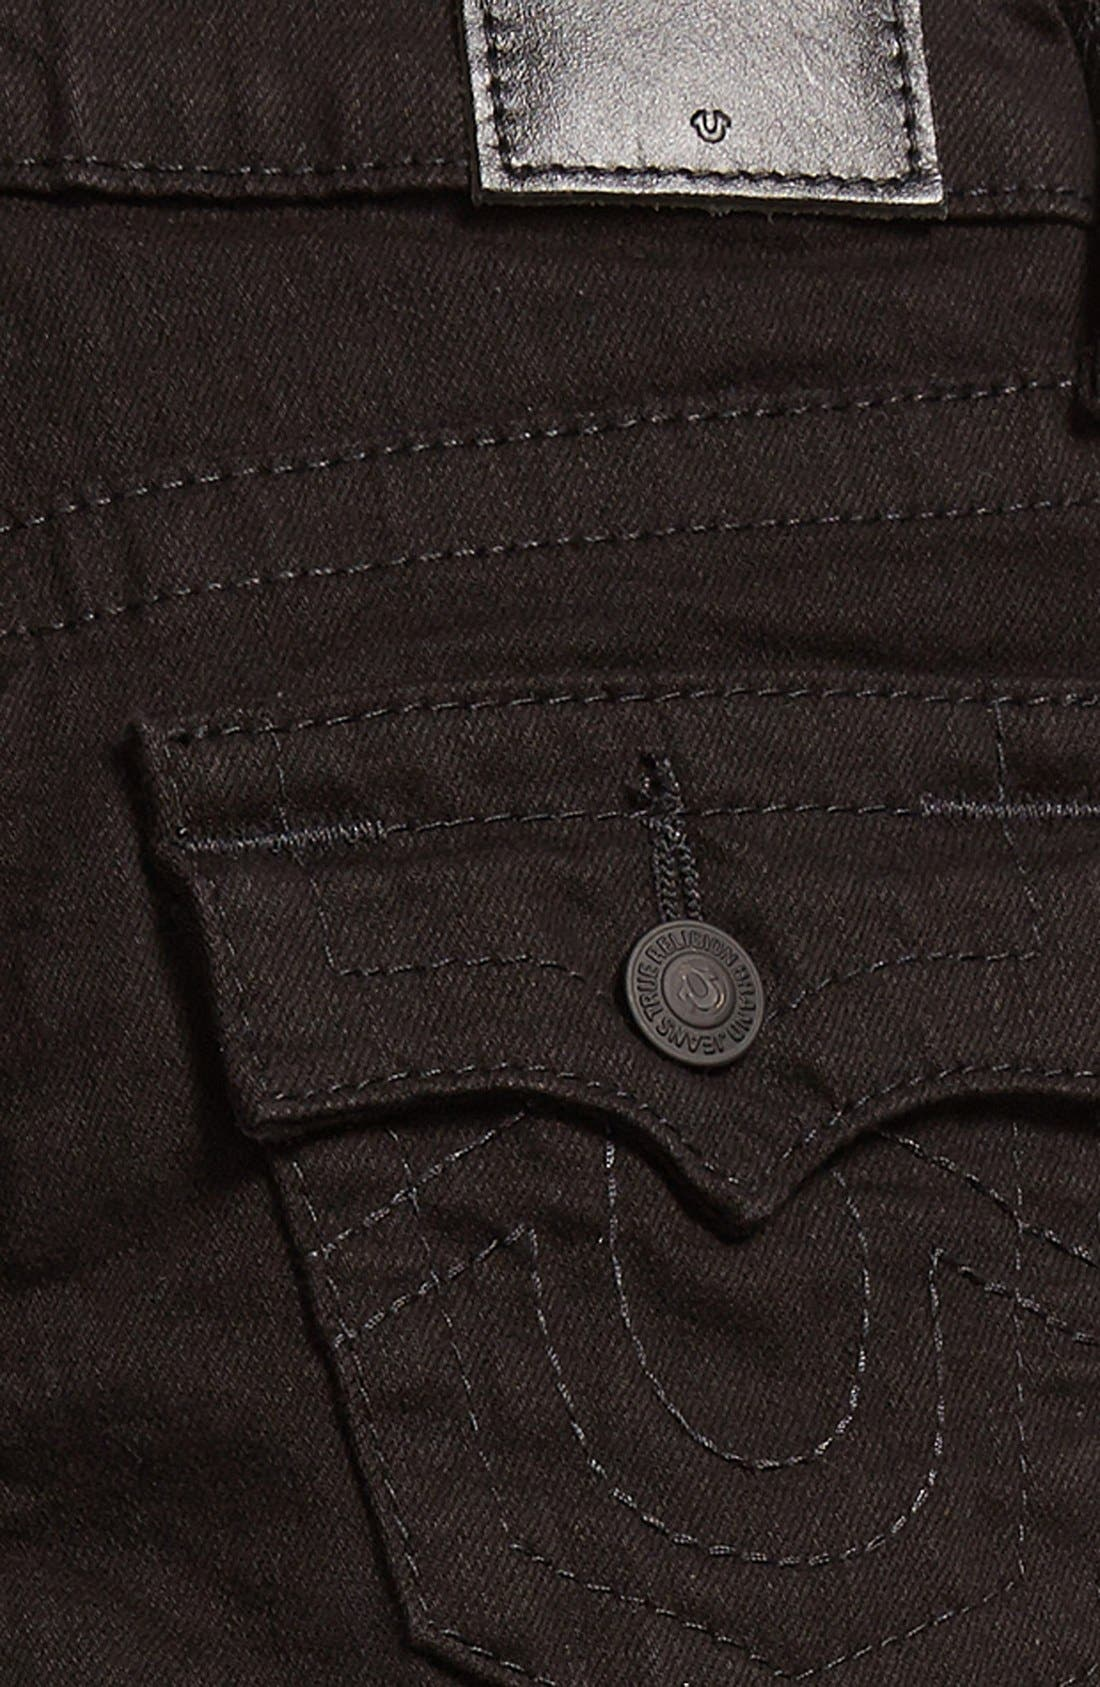 Alternate Image 3  - True Religion Brand Jeans 'Geno' Relaxed Slim Fit Jeans (Toddler Boys & Little Boys)